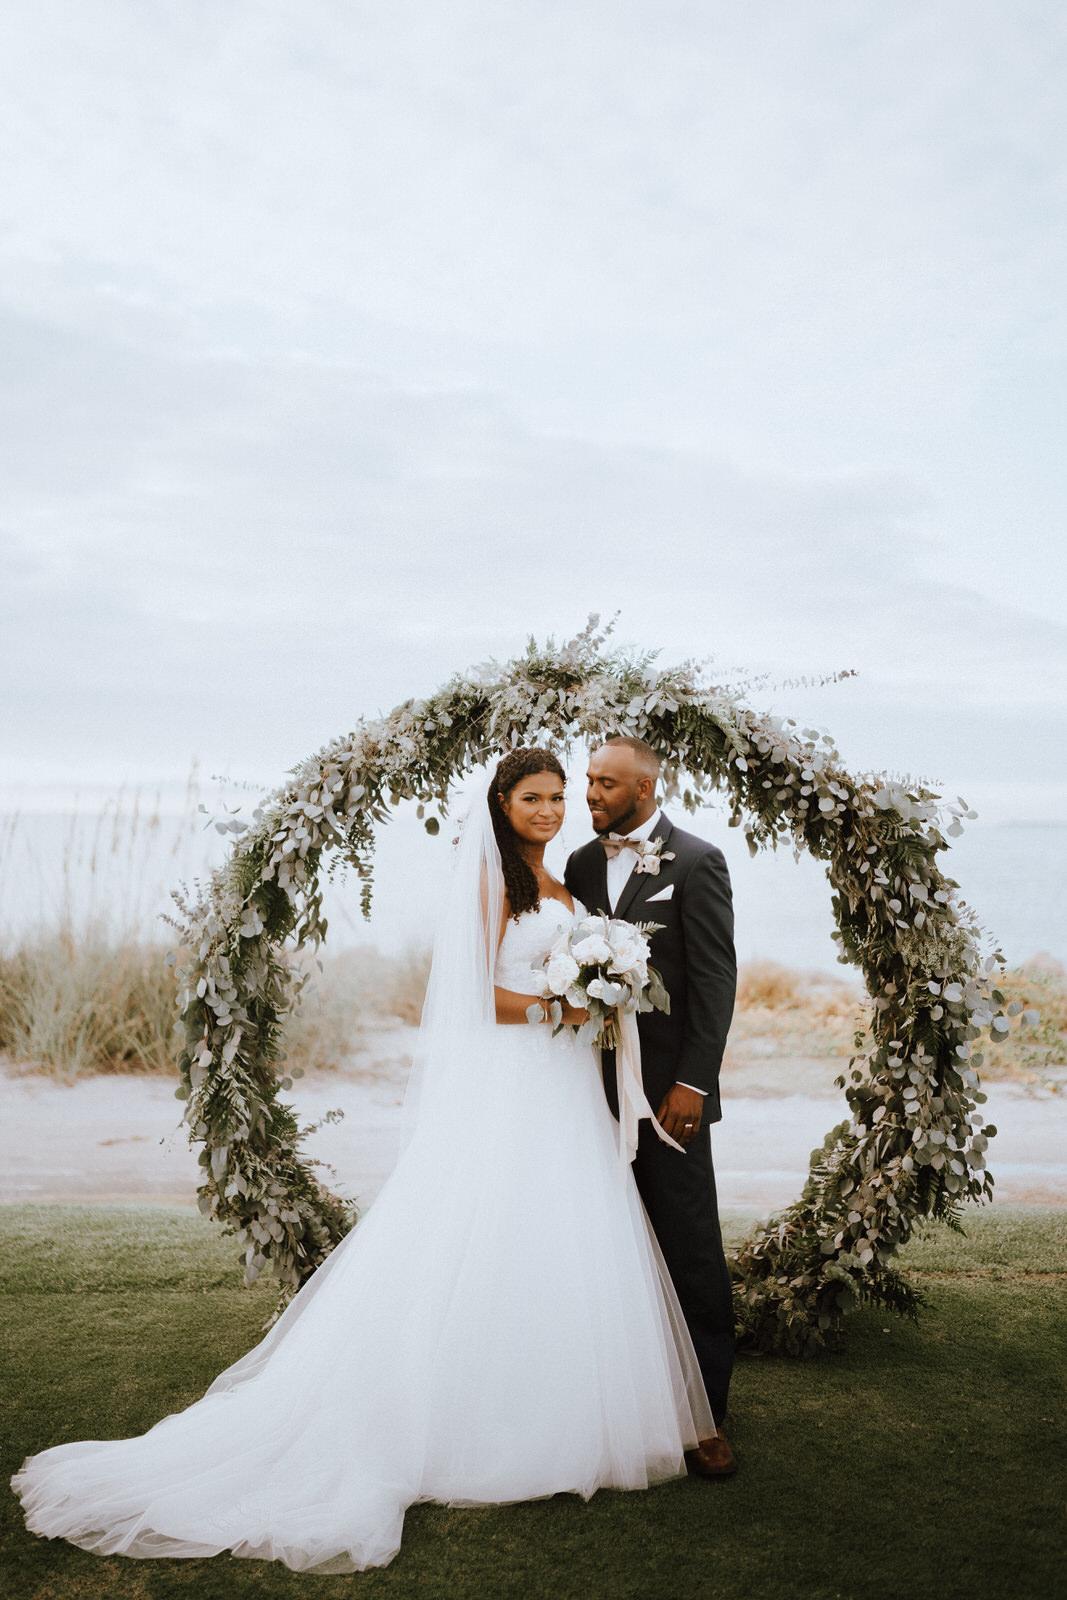 South Seas Island Resort Elopement- Alyana and Shawn- Michelle Gonzalez Photography-535.JPG